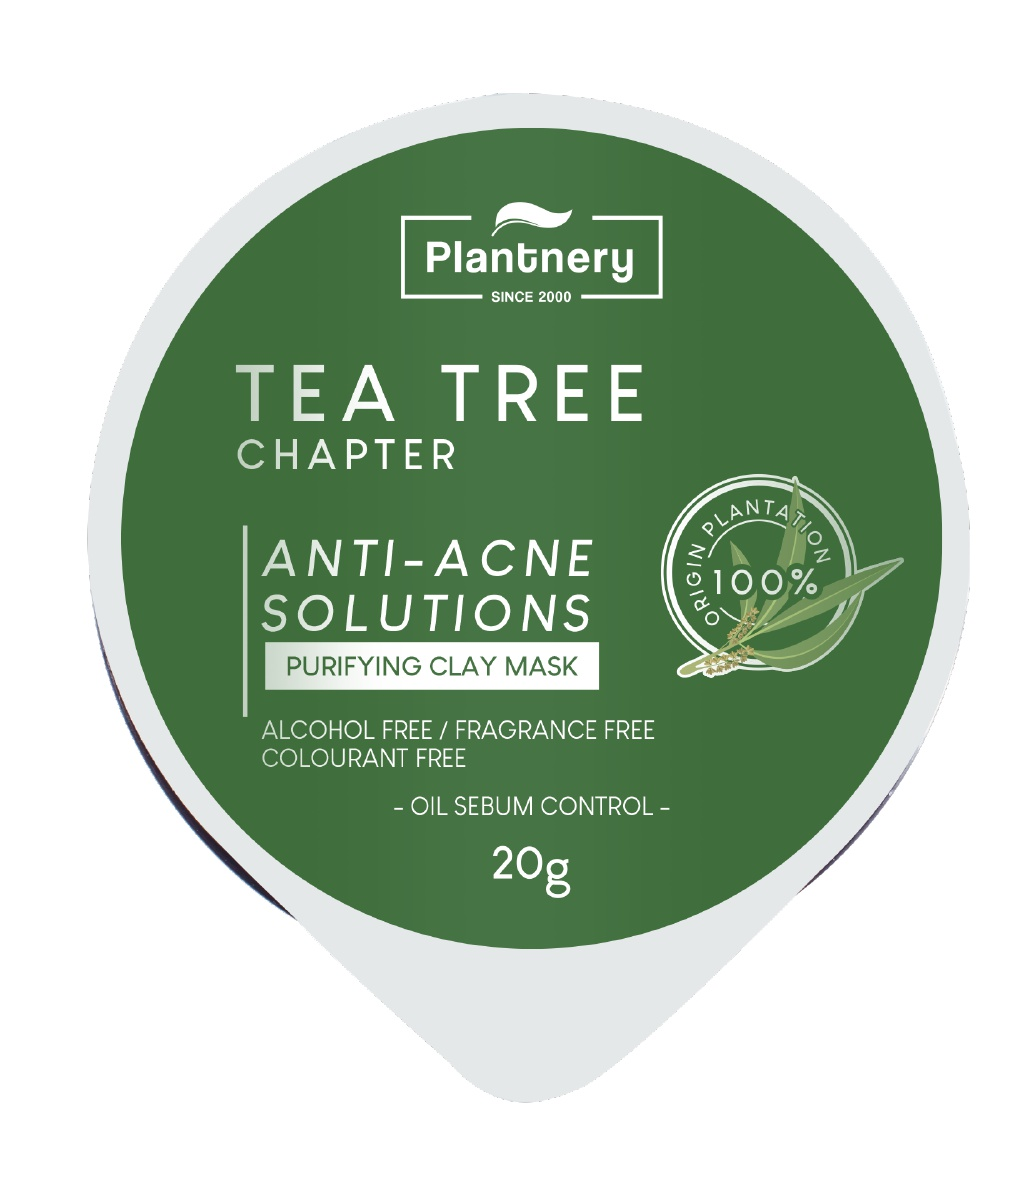 Plantnery Tea Tree Purifying Clay Mask